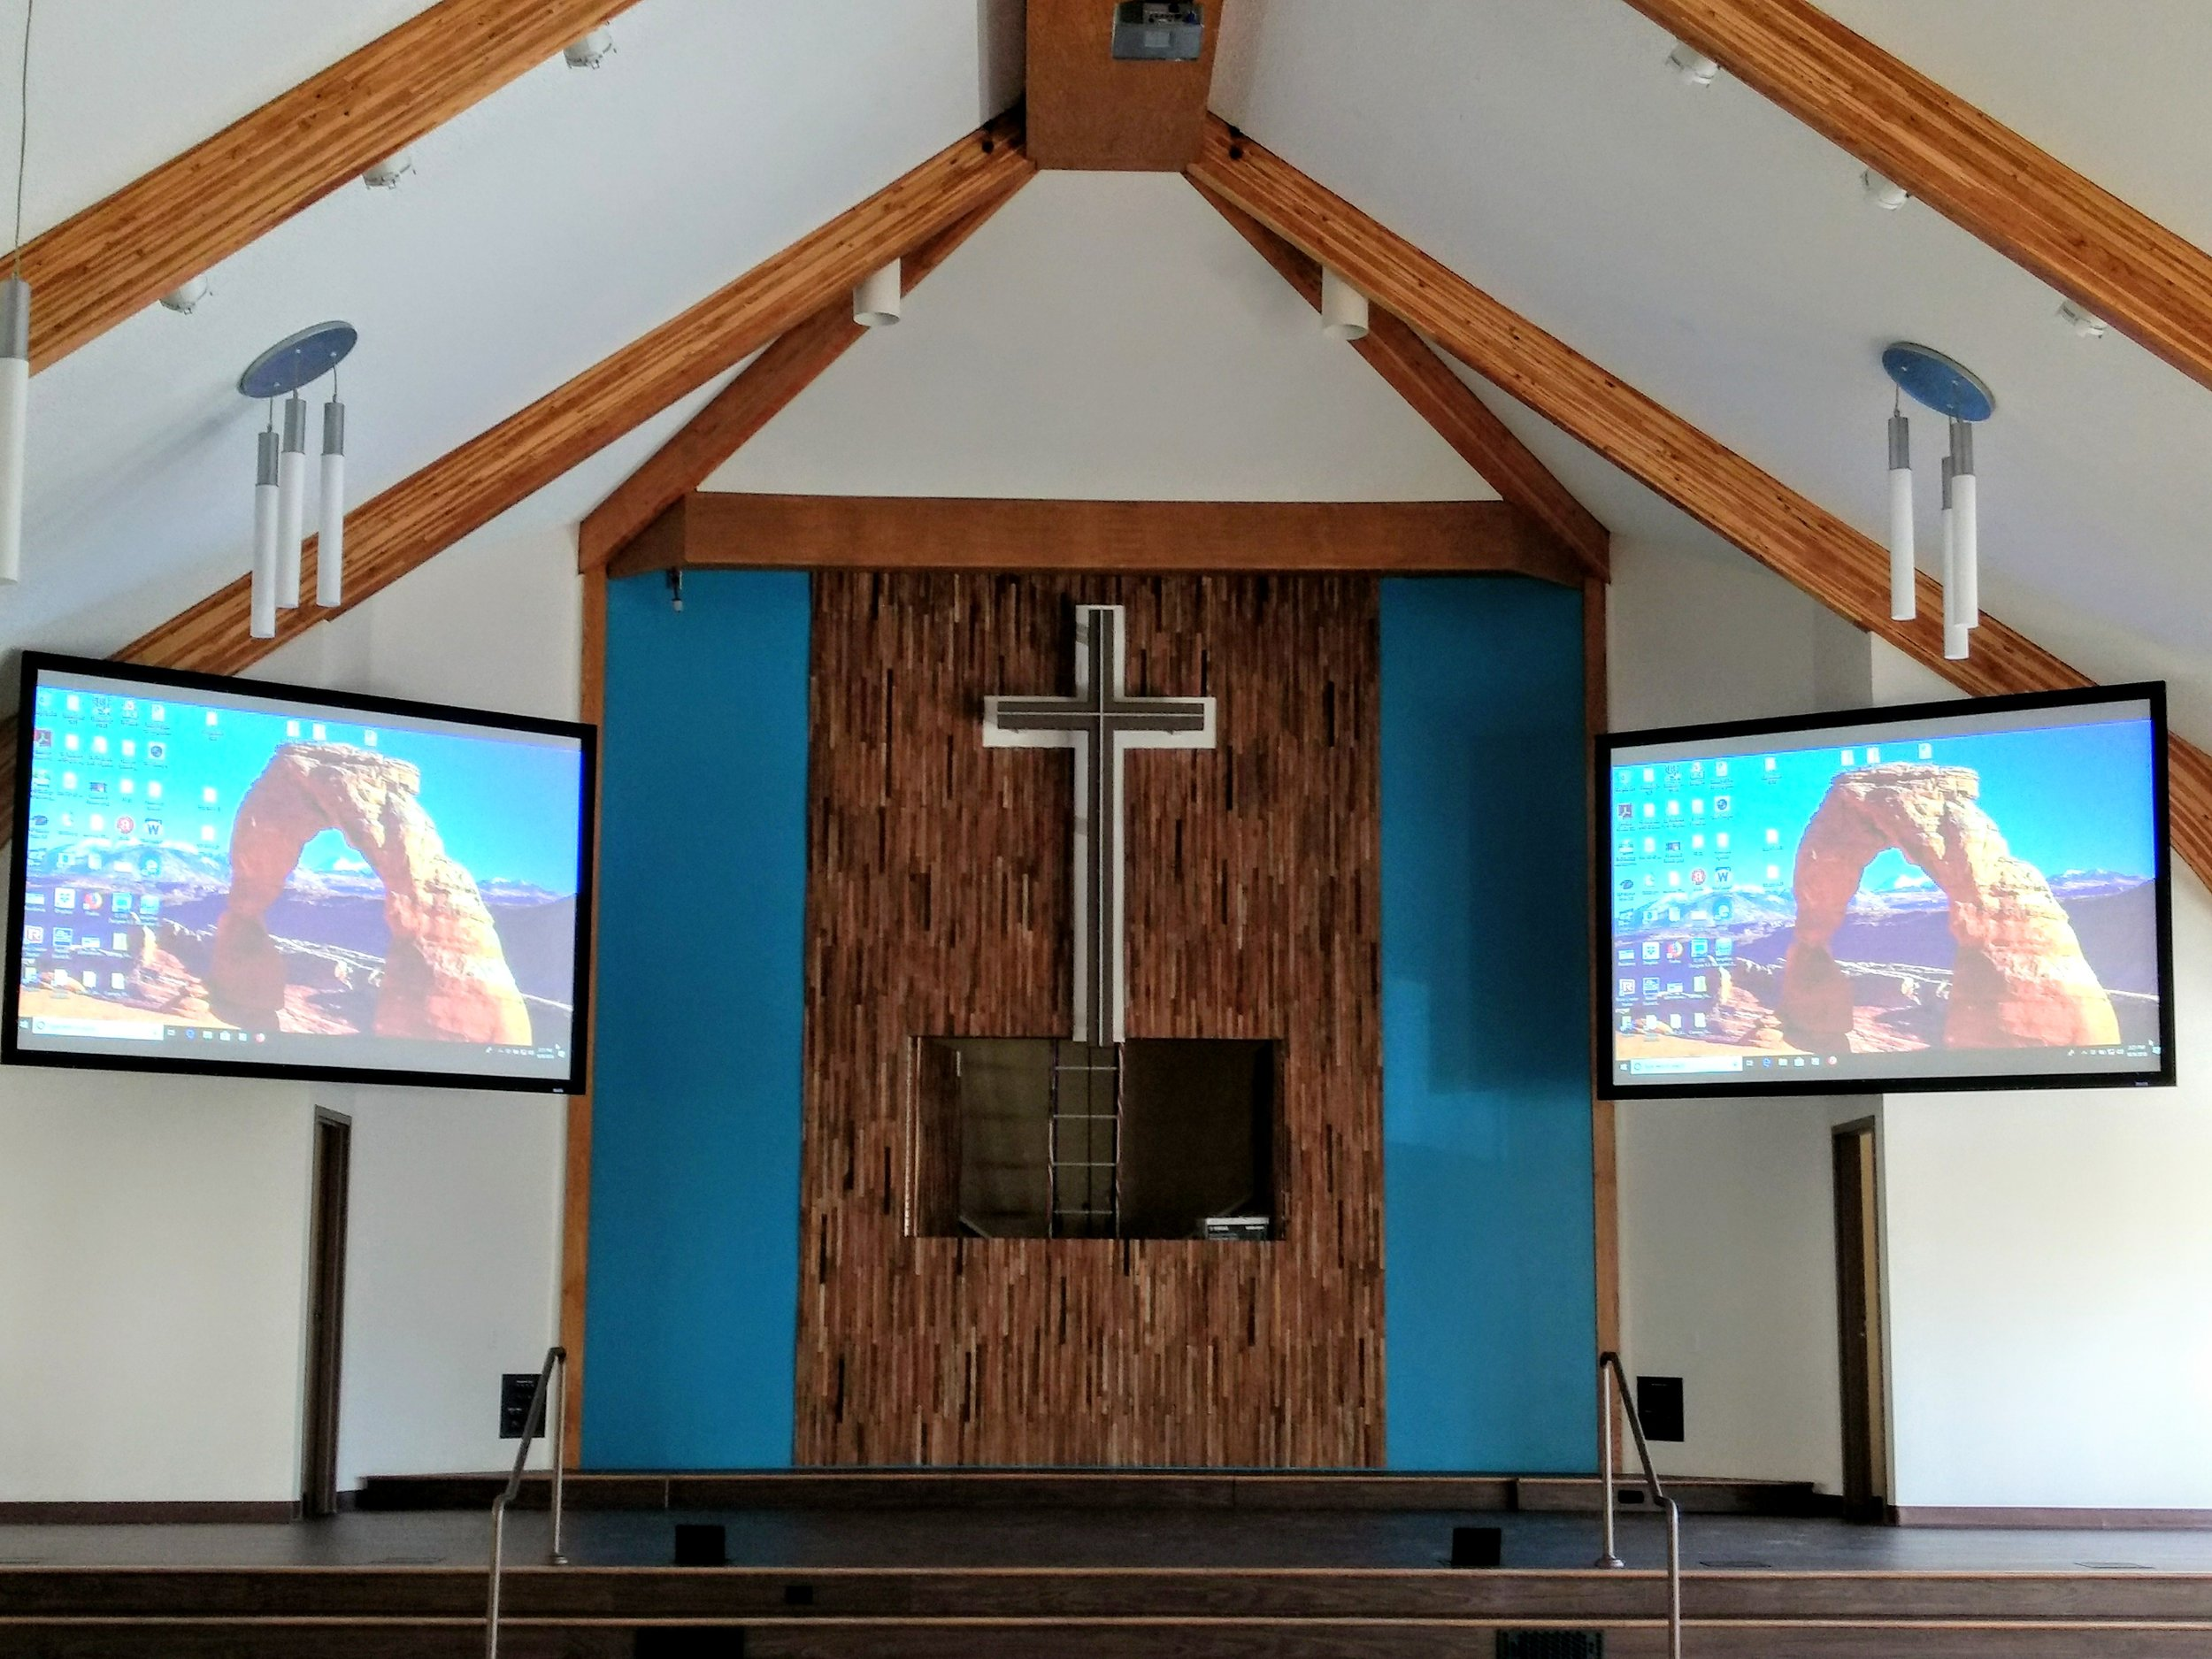 Sanctuary Dedication Service - Come celebrate with us…Sunday, December 2, 2018 9:45 am